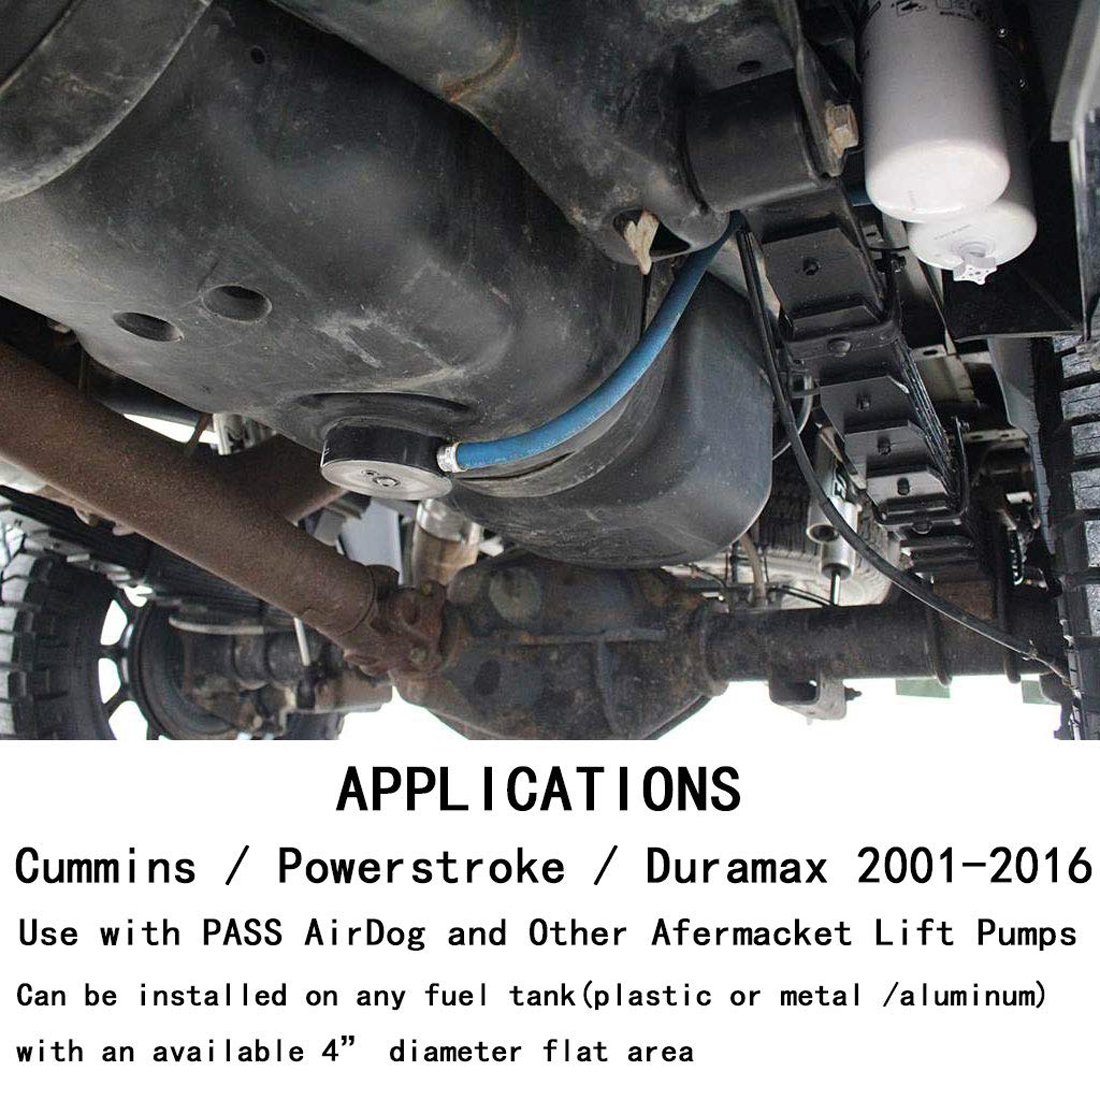 FASS AirDog Diesel Gas Fuel Pumps Tanks Sump Kit For Cummins Powerstroke Duramax